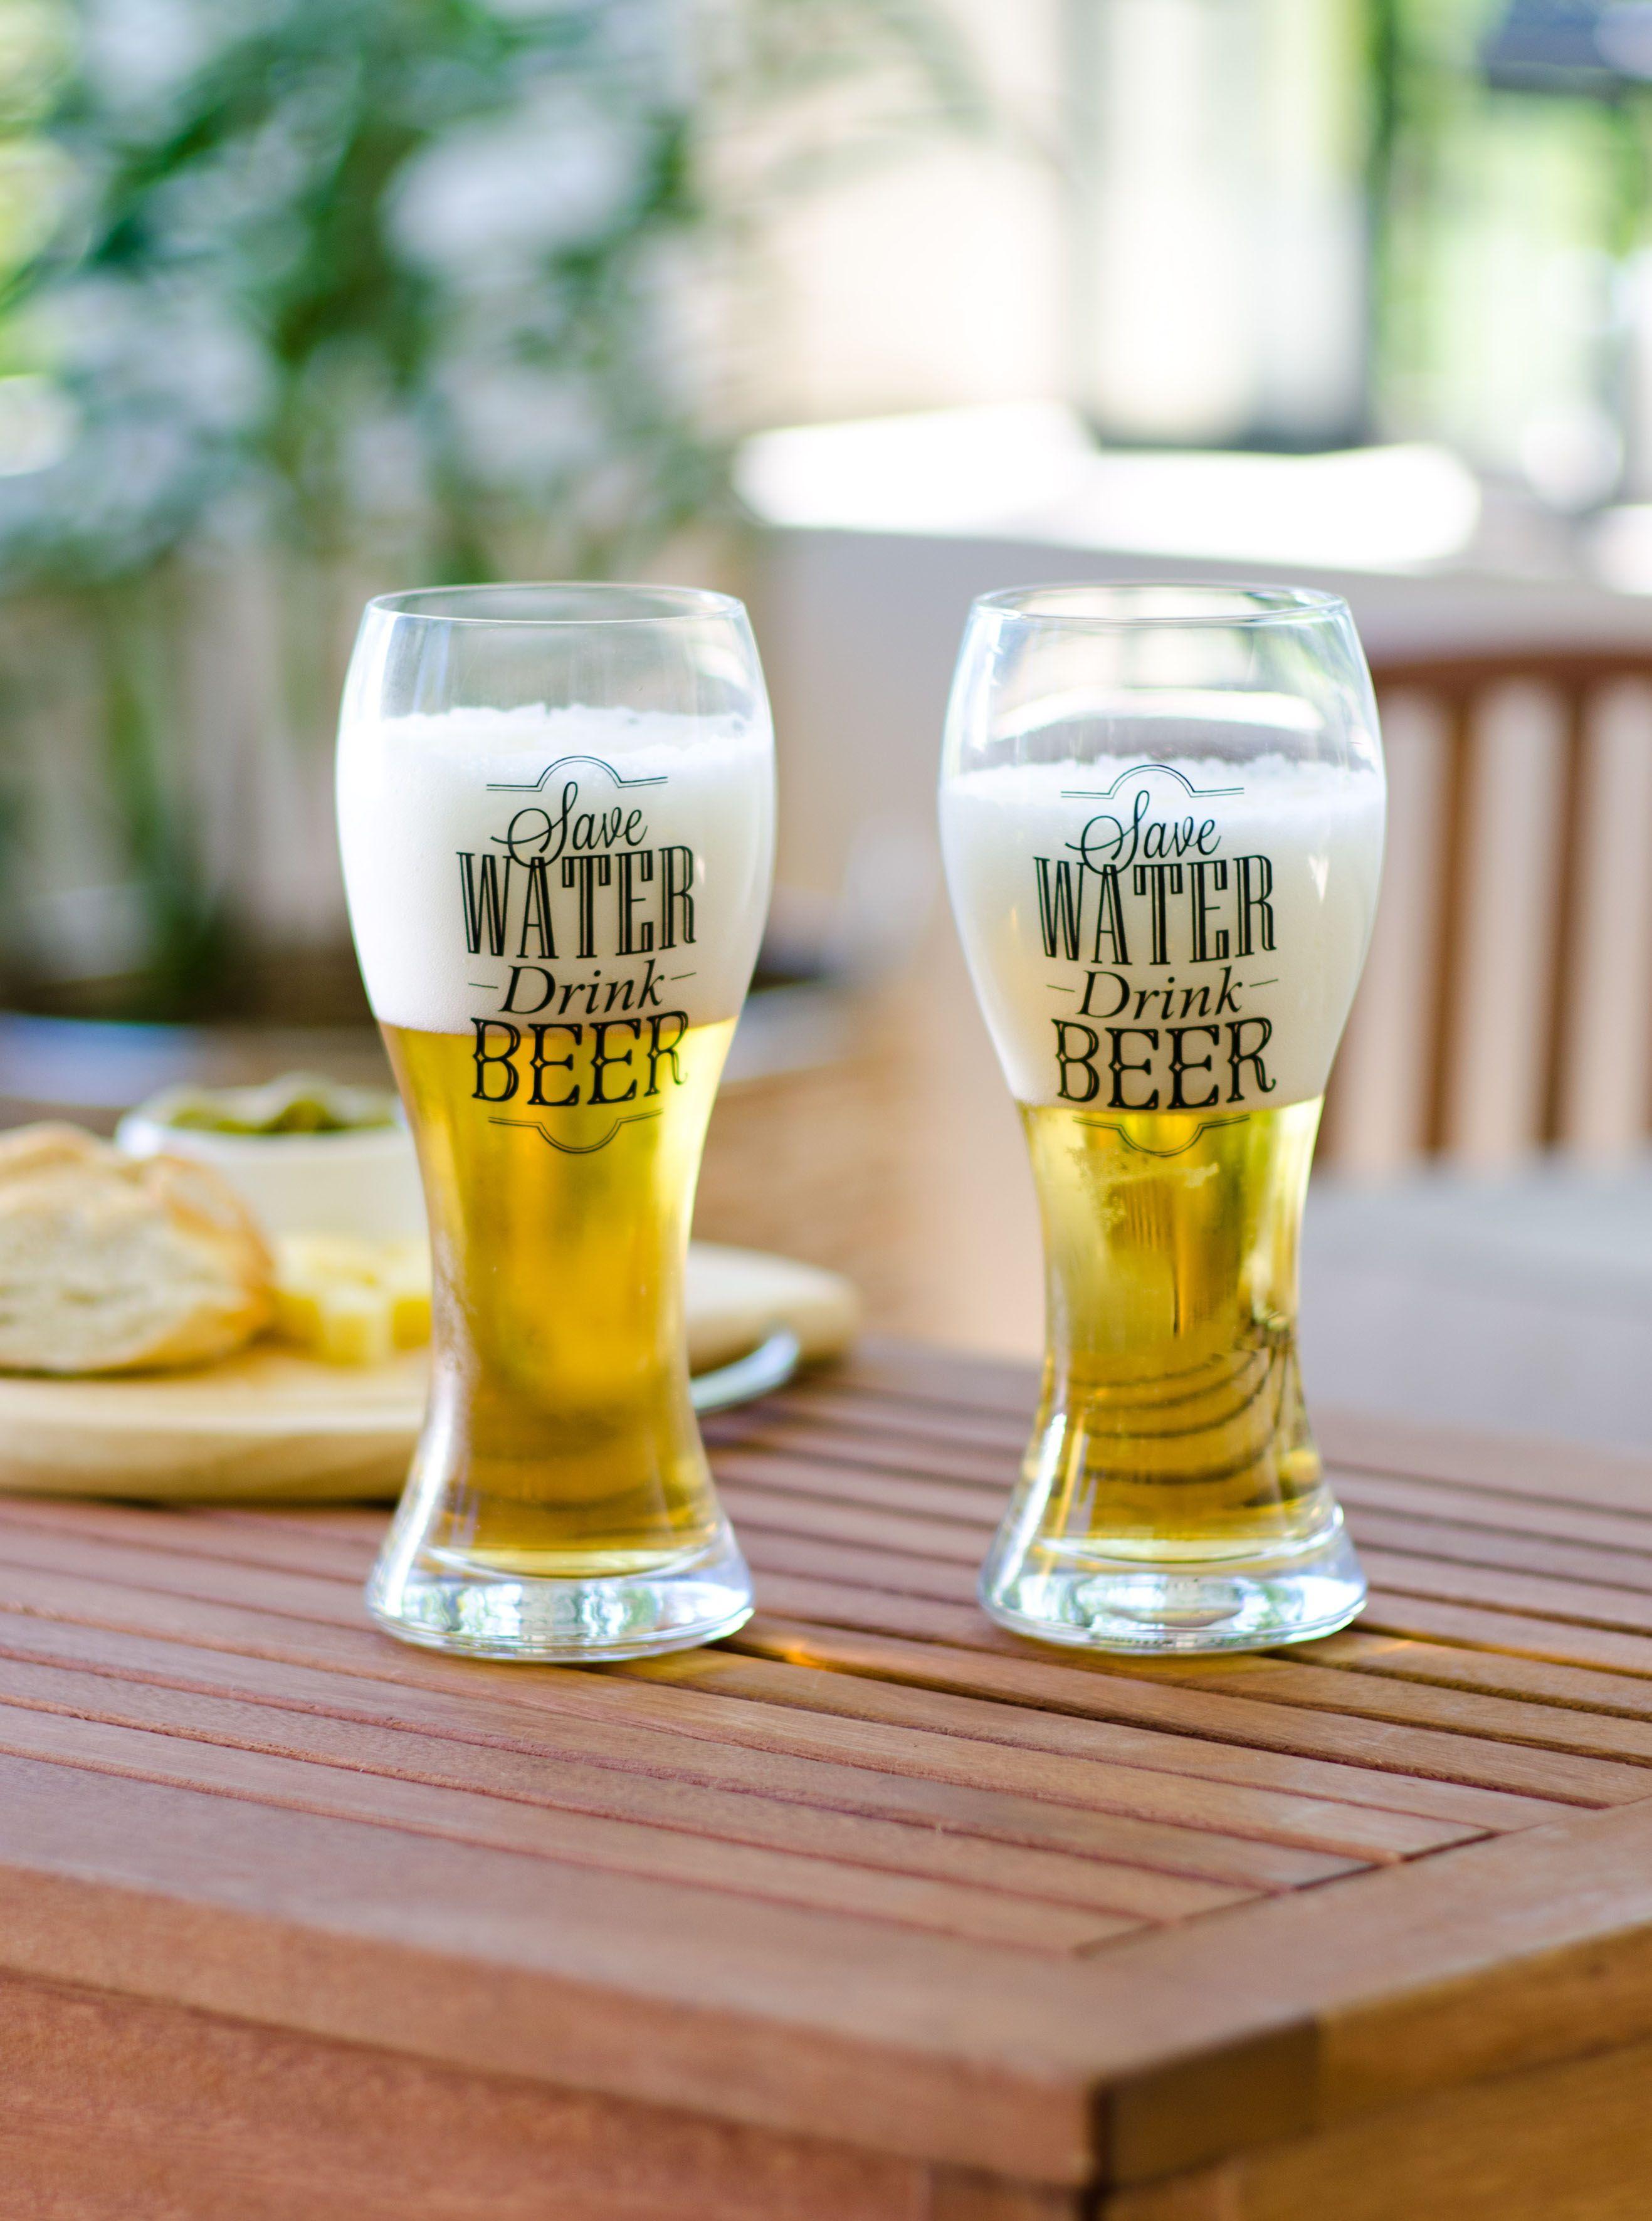 Vaso Cervecero #cerveza #beer #vaso #pinta #frase #vidrio ...